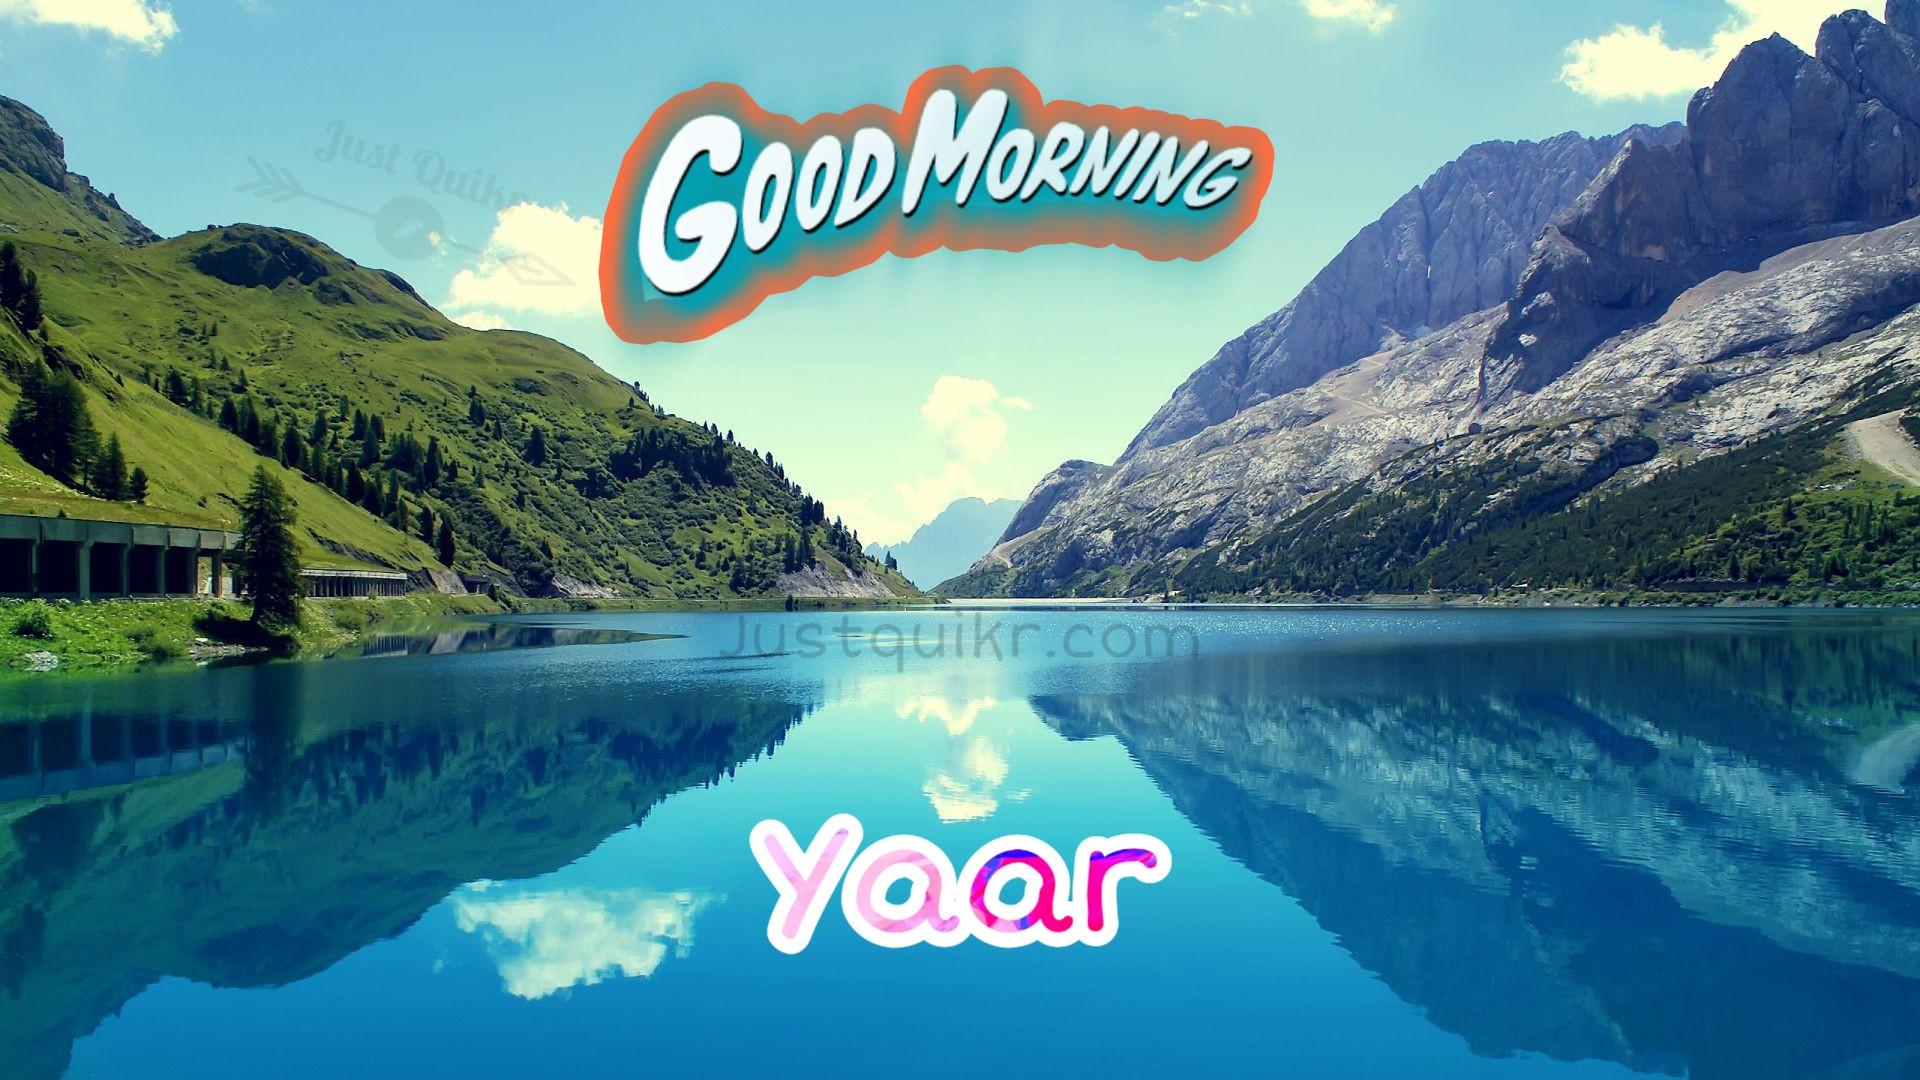 GoodMorning Yaar Pics Images